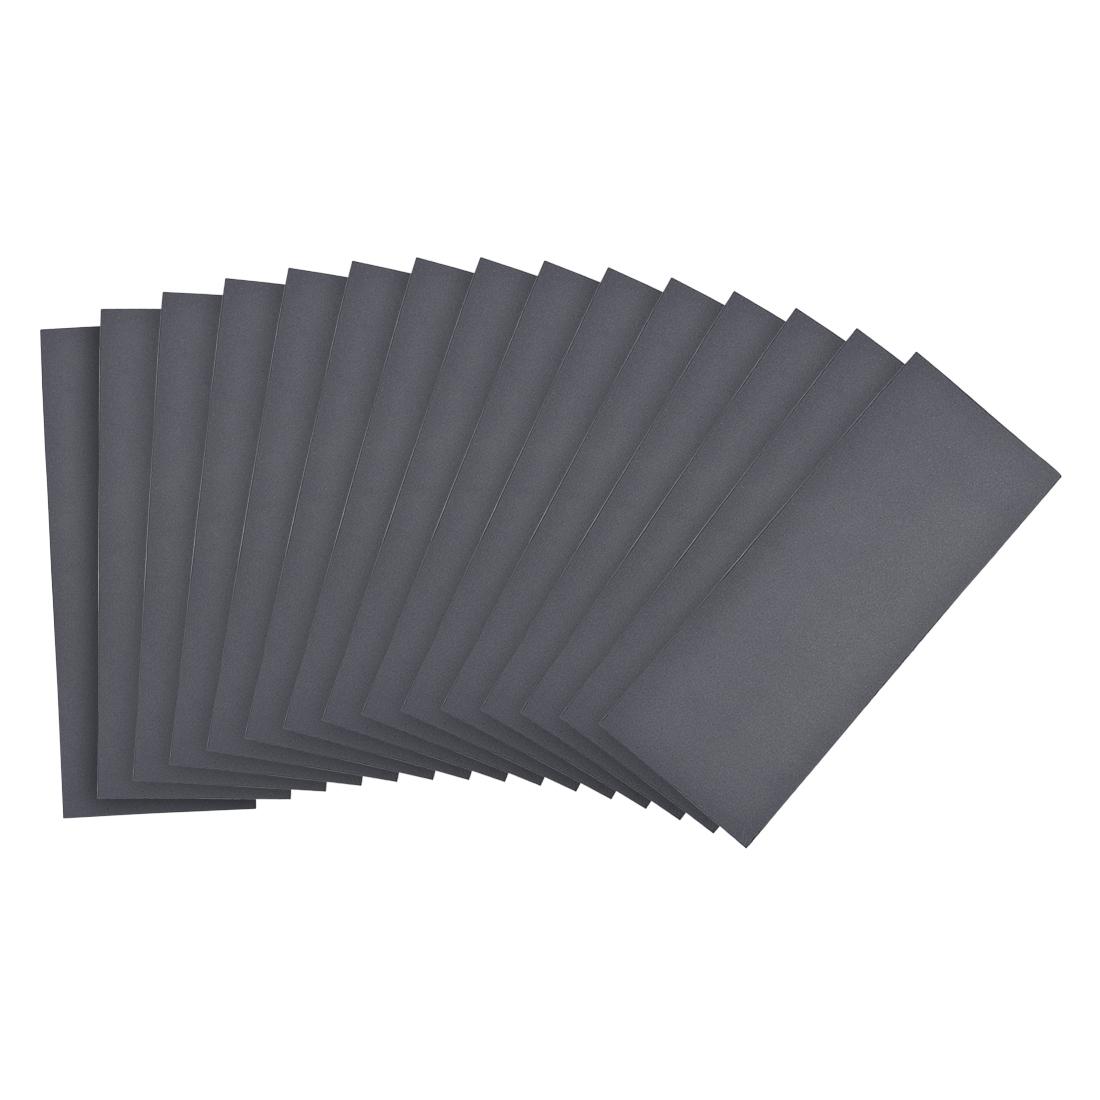 Waterproof Sandpaper, Wet Dry Sand Paper Grit of 800, 9 x 3.7inch 15pcs